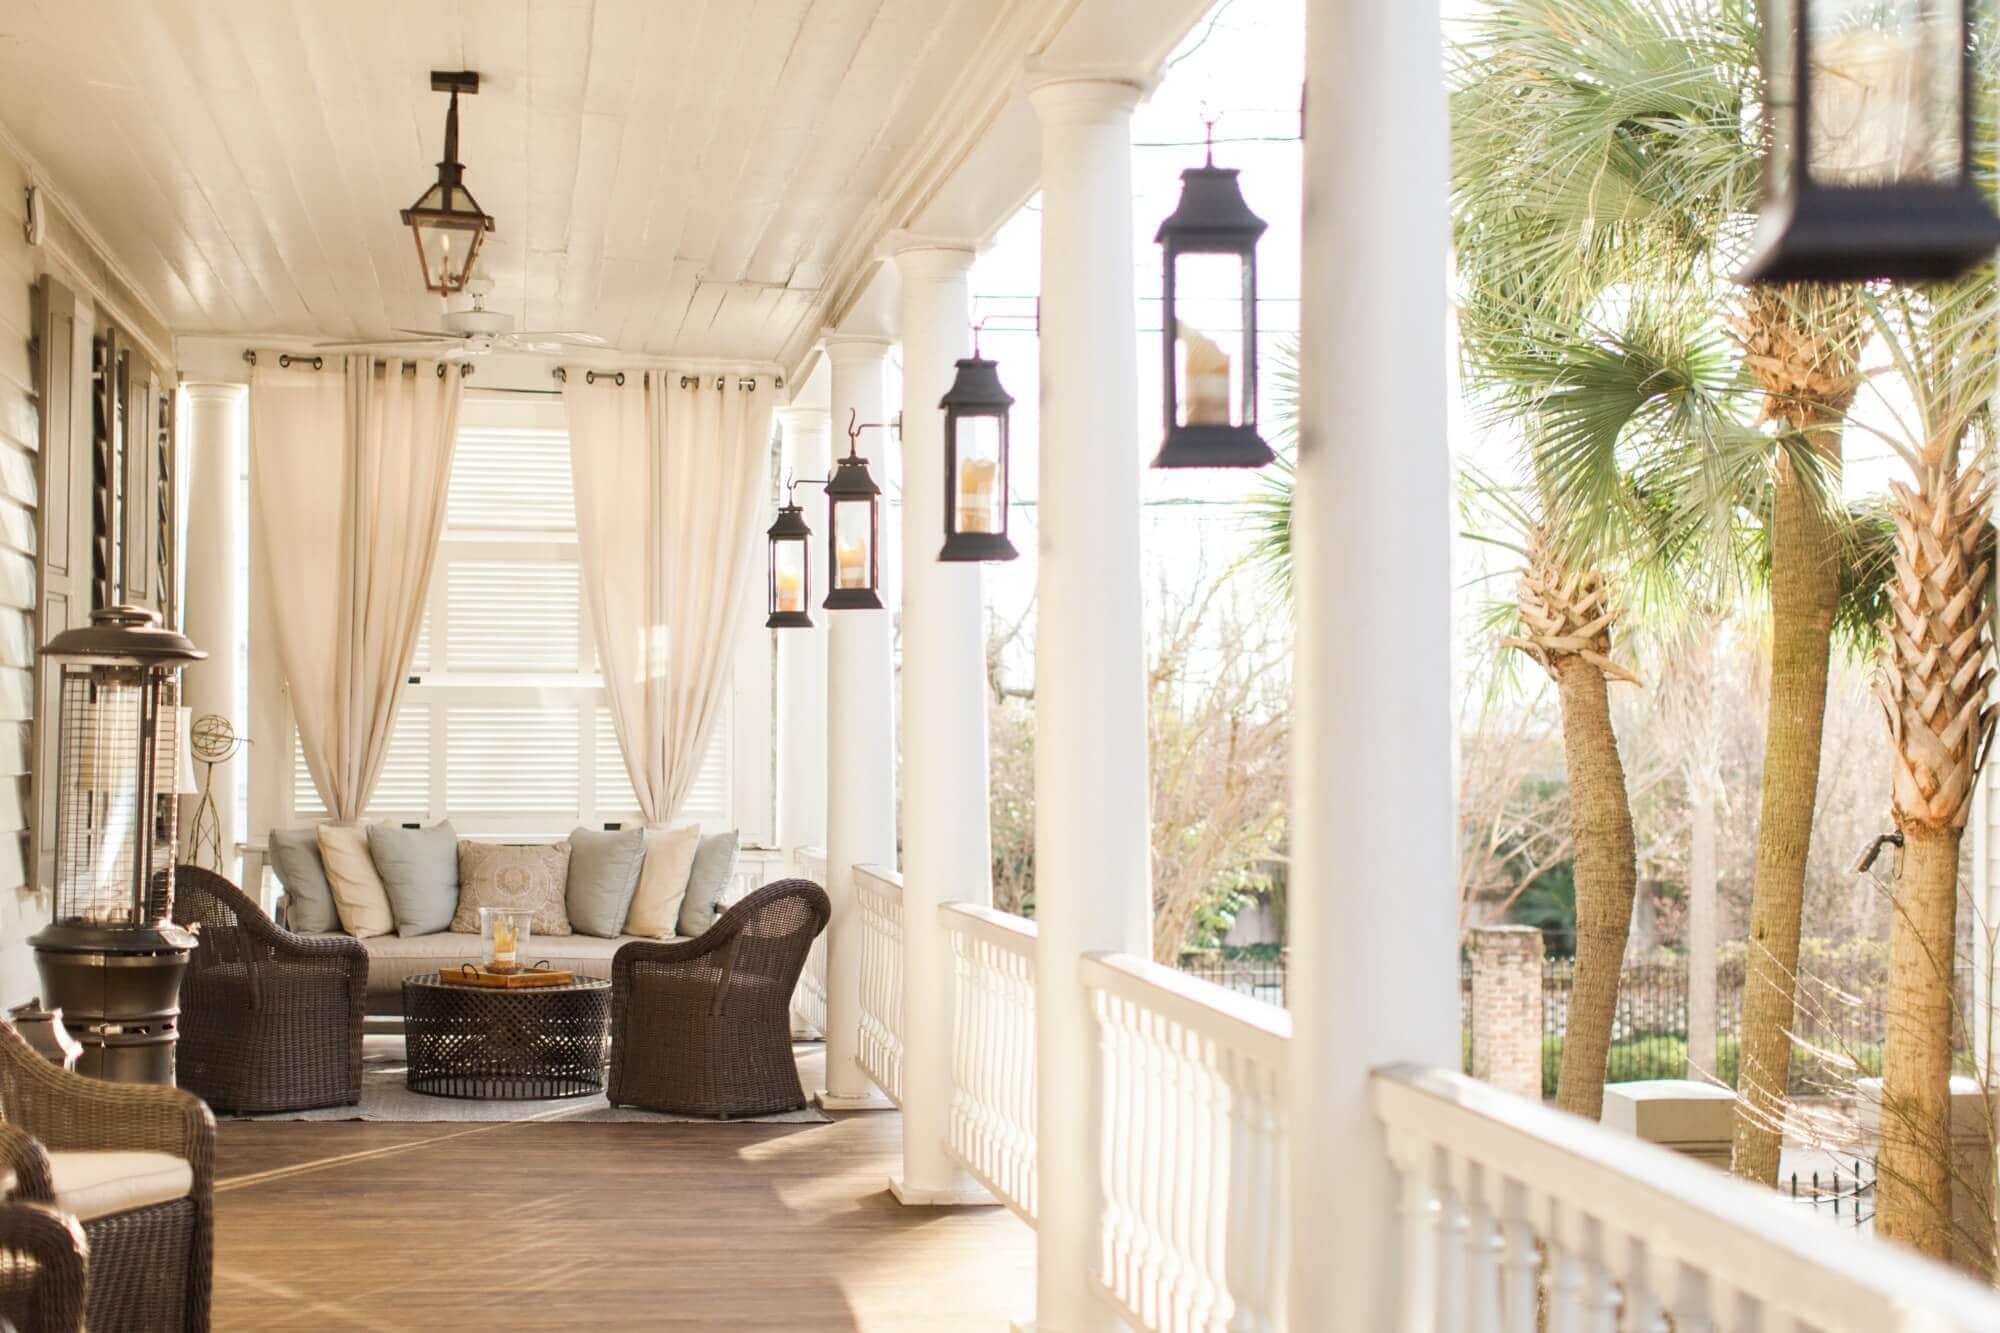 Anson Suite atZero George Street, Charleston - Photo by Eric Kelley